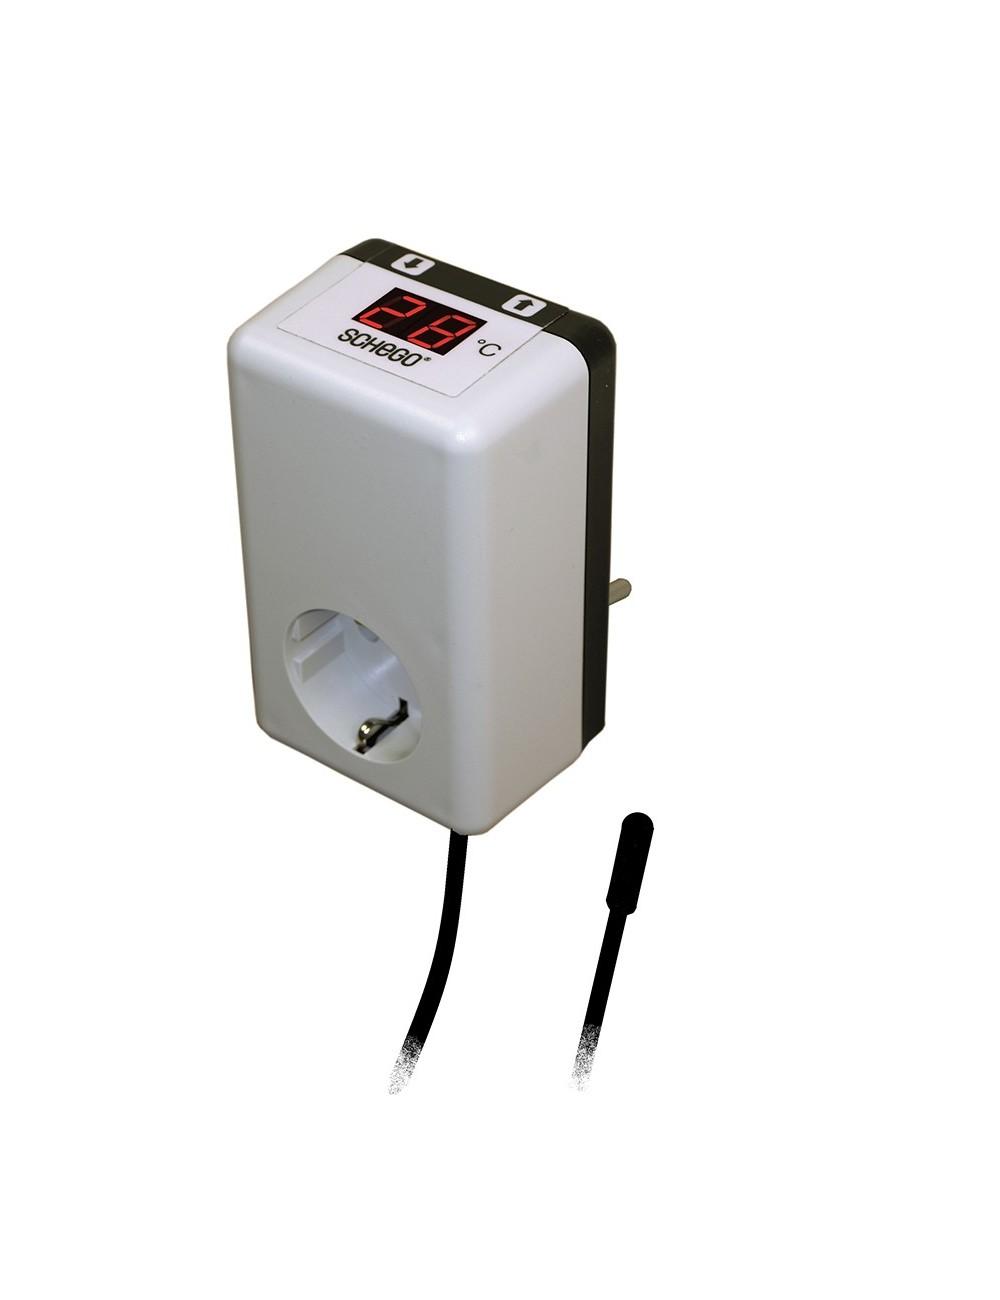 SCHEGO - Thermostat TRD - Thermostat résistance jusqu'à 1000w